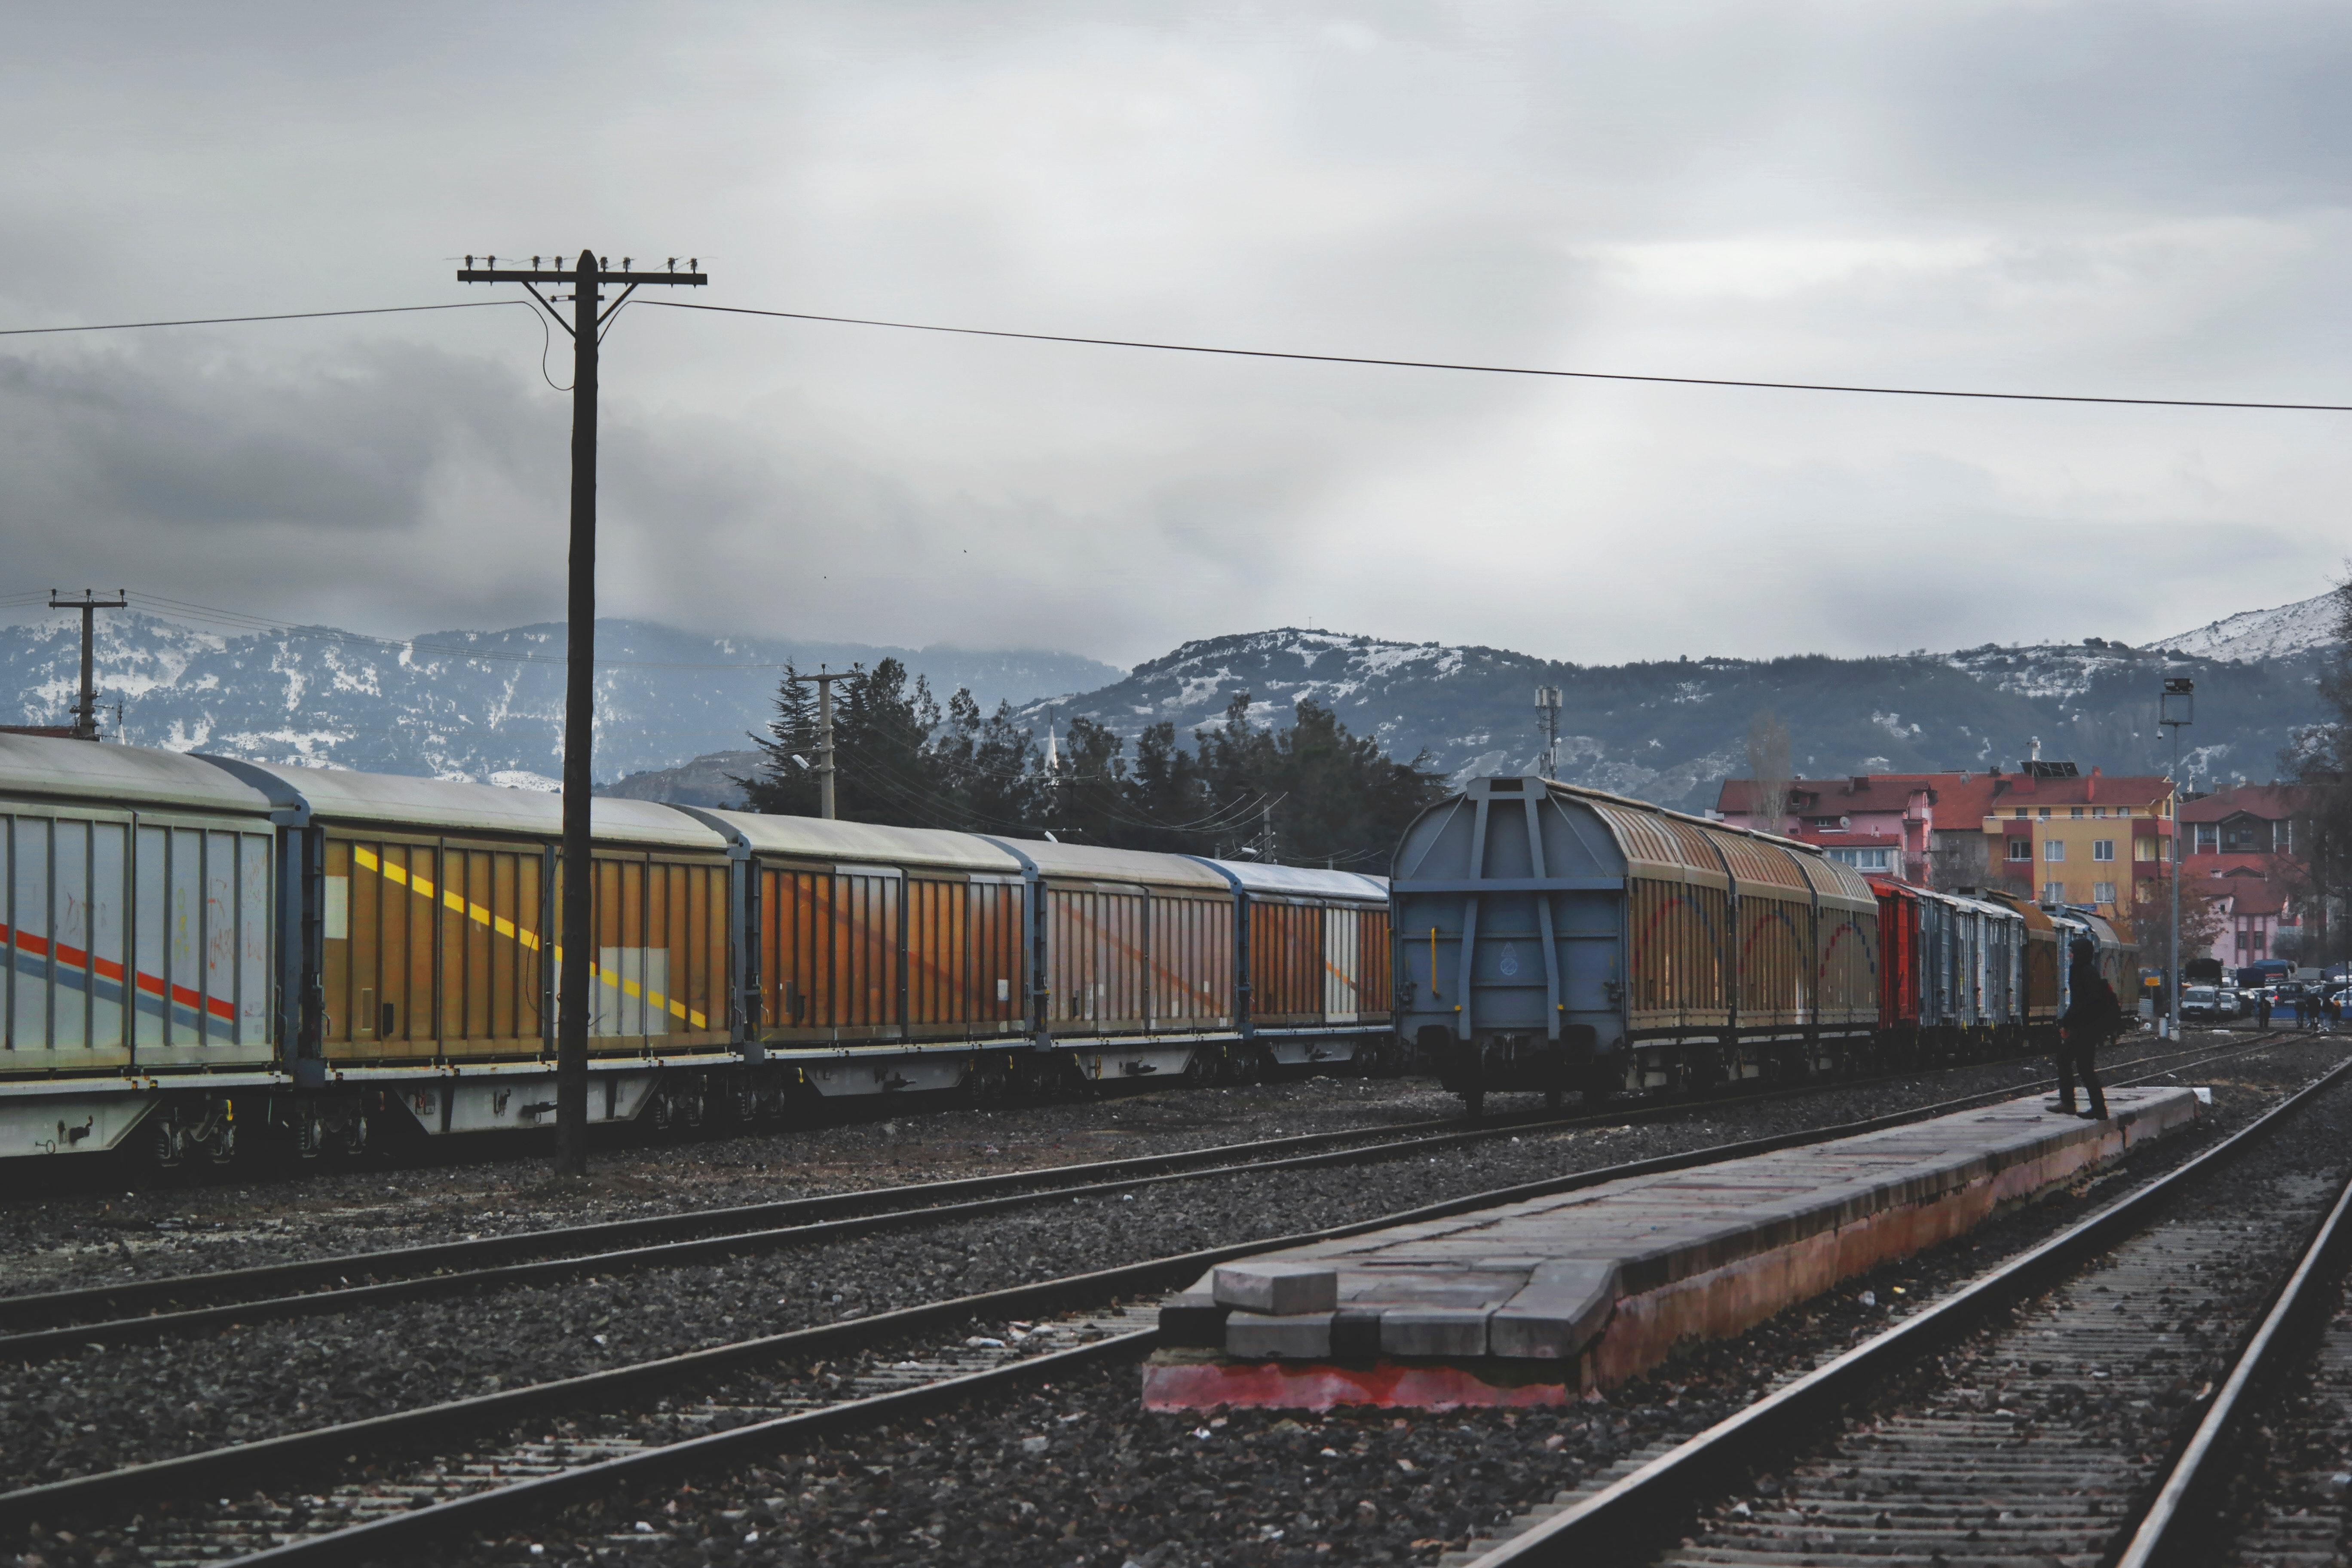 Train Running on Train Track Under Gray Sky at Daytime, Cargo, Railway, Vehicle, Travel, HQ Photo